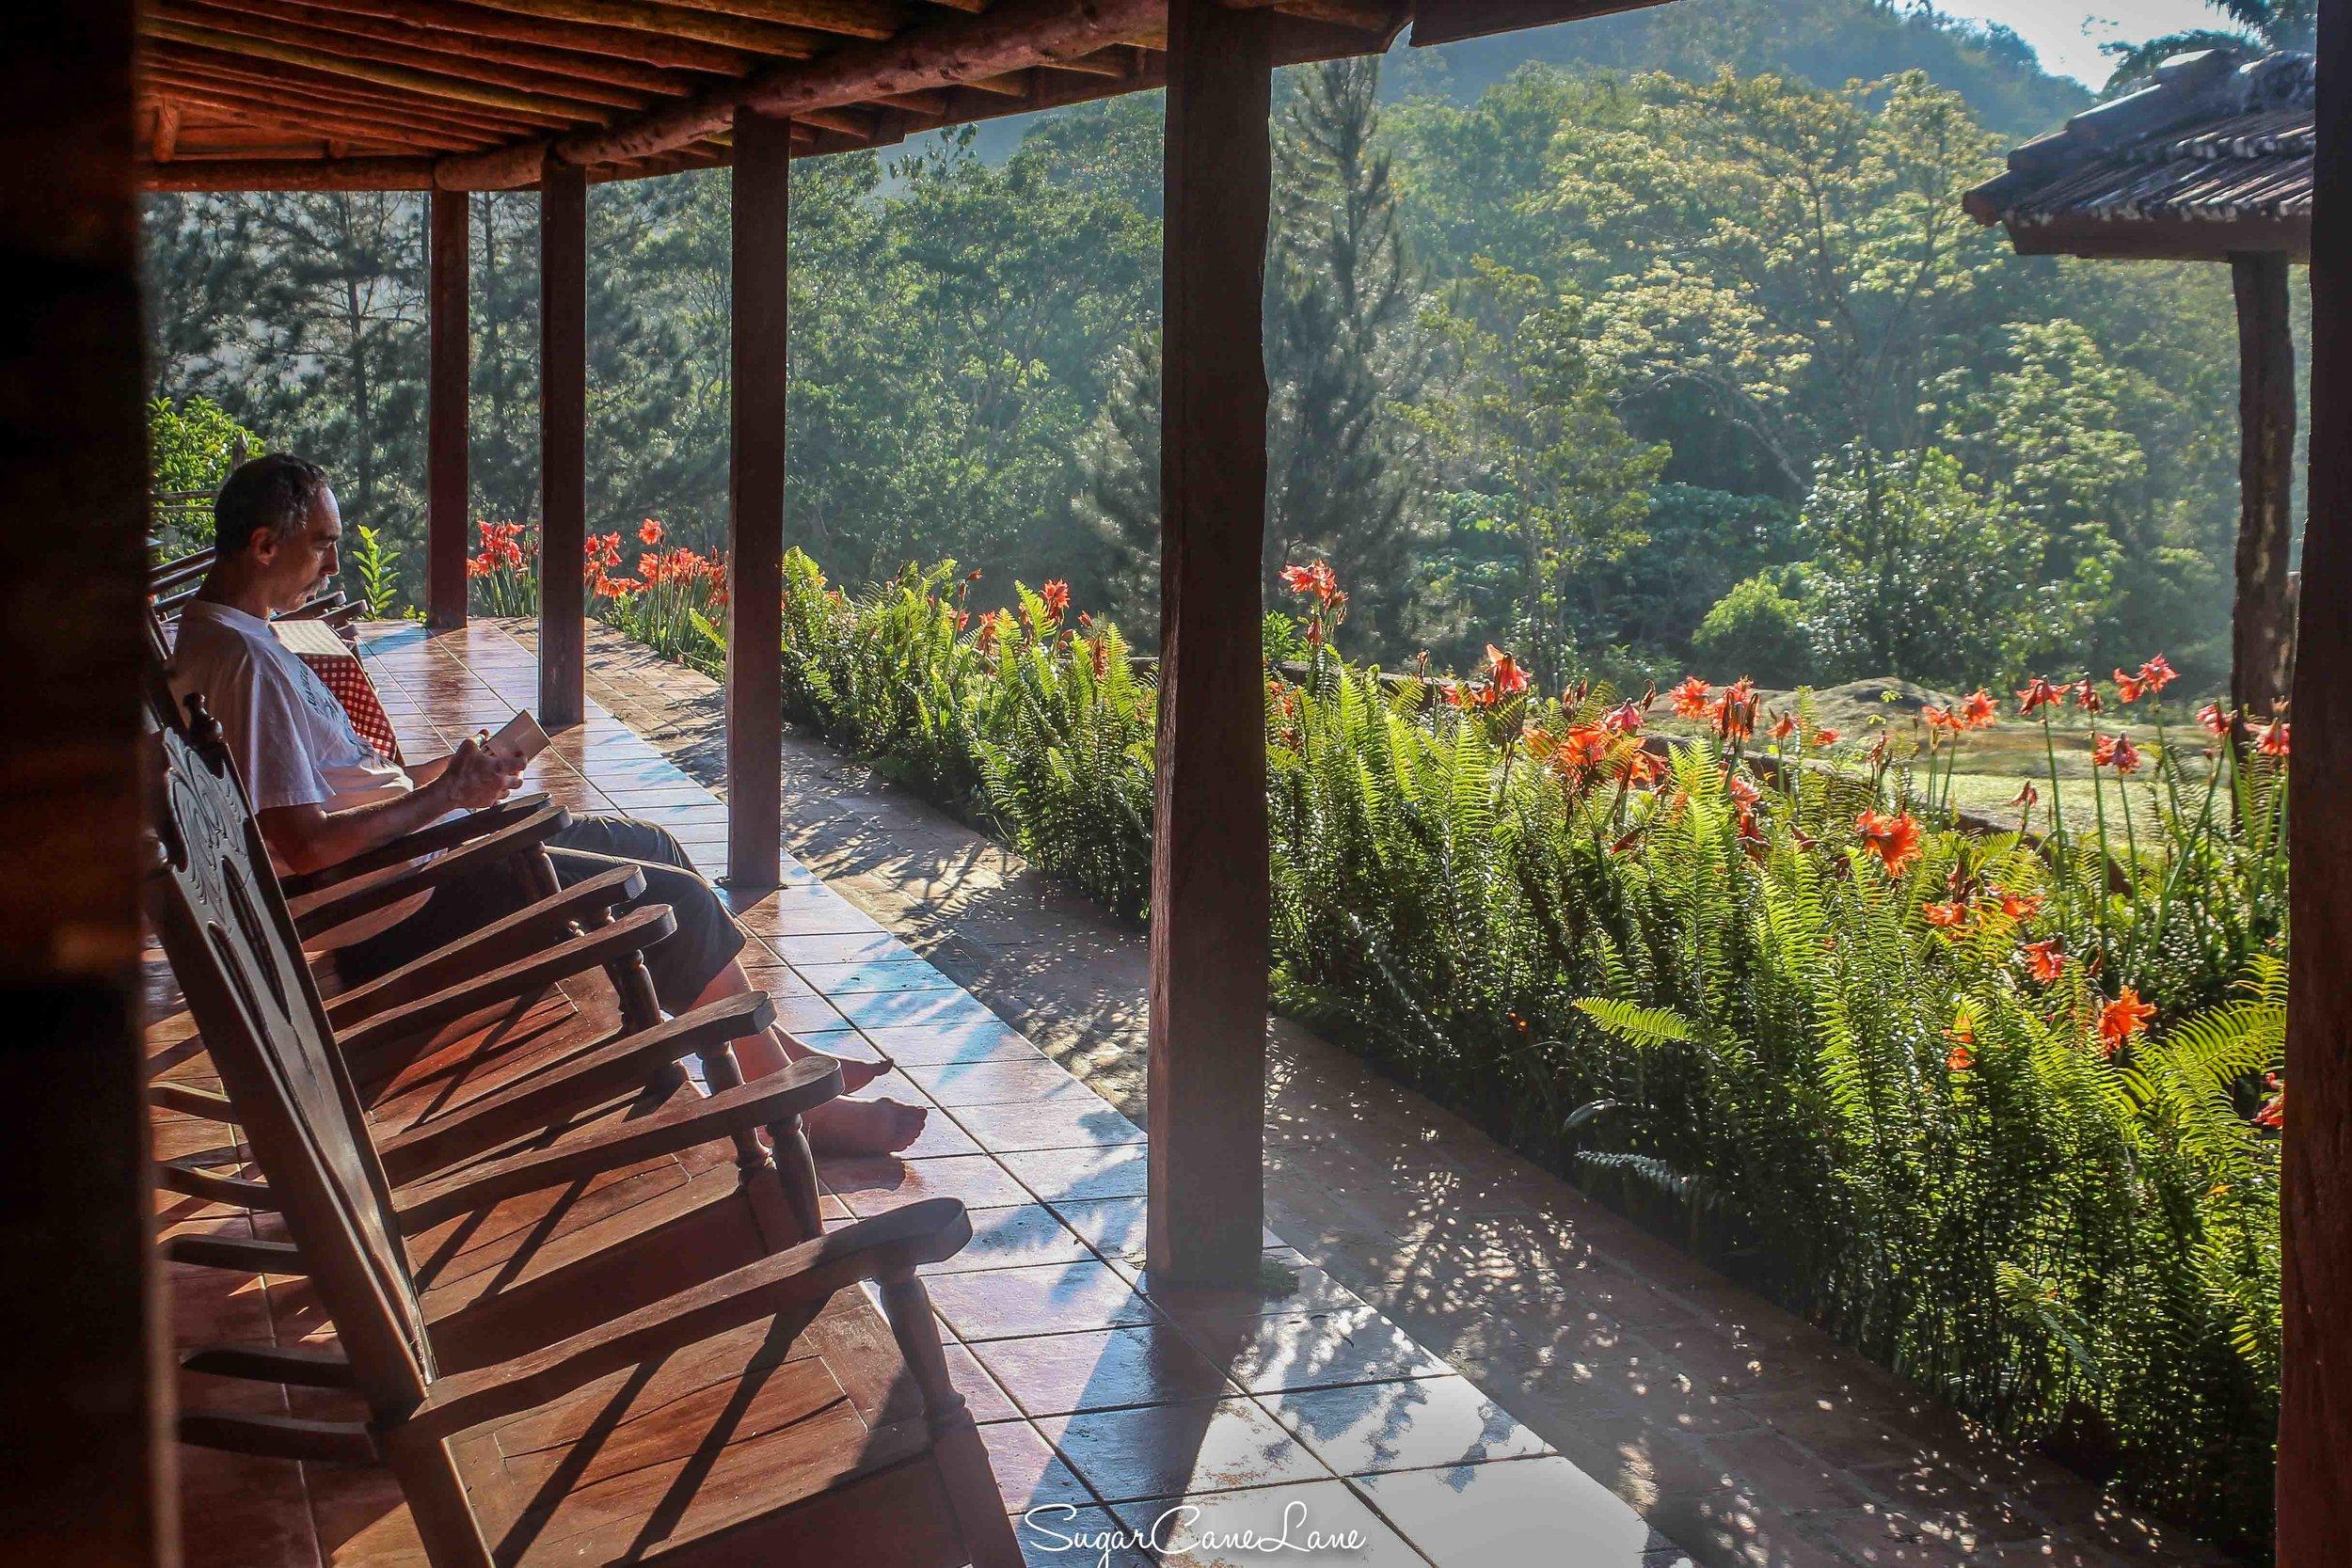 Cuba_Banaos : veranda